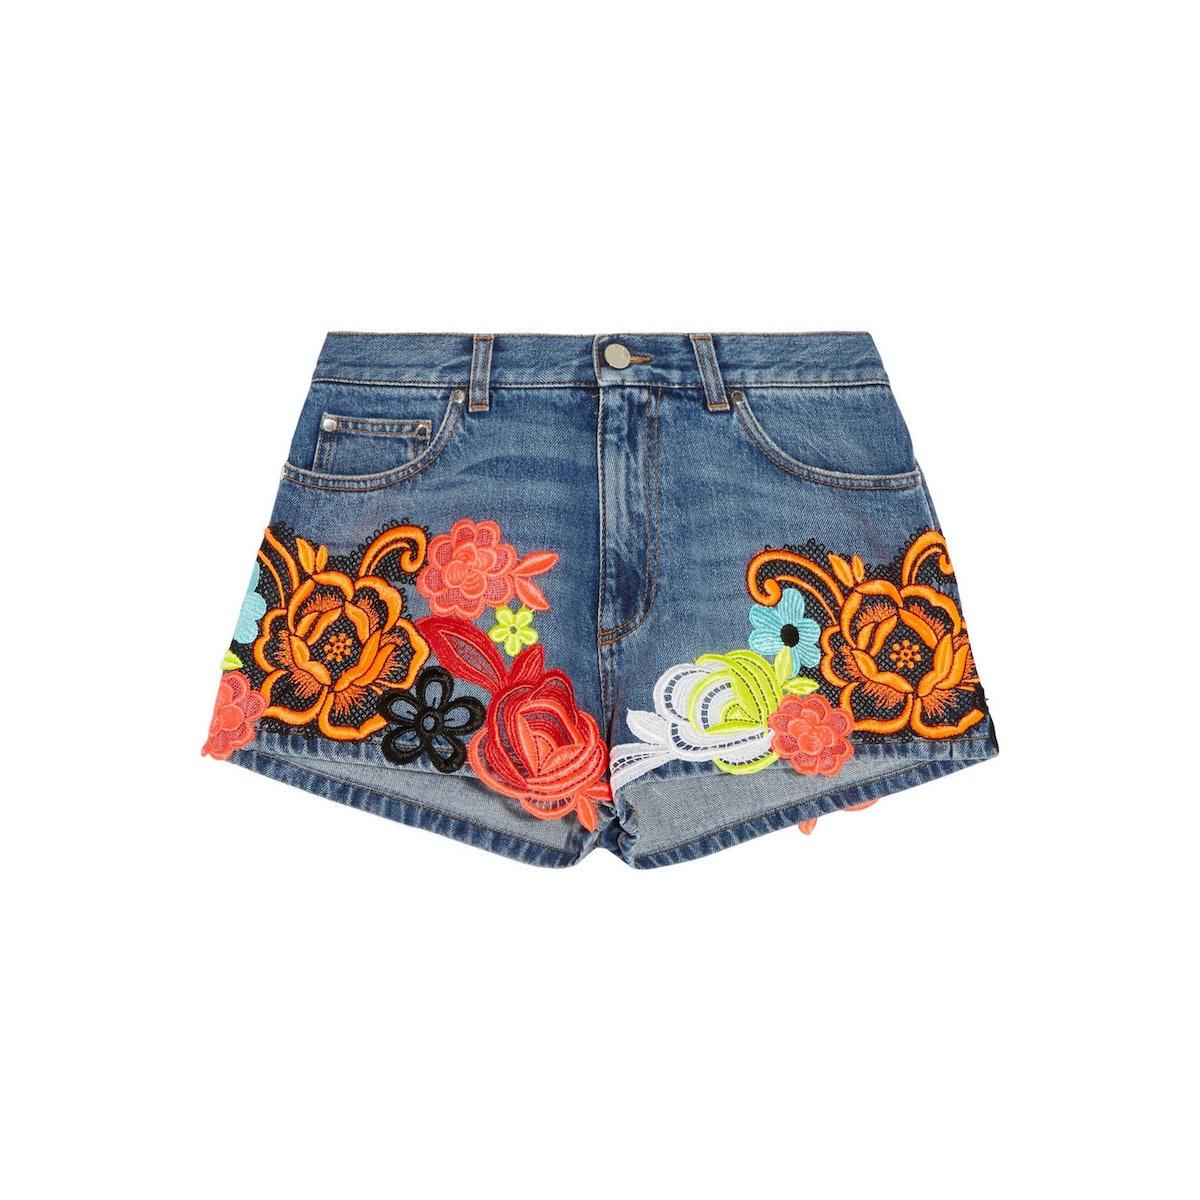 Christopher Kane shorts